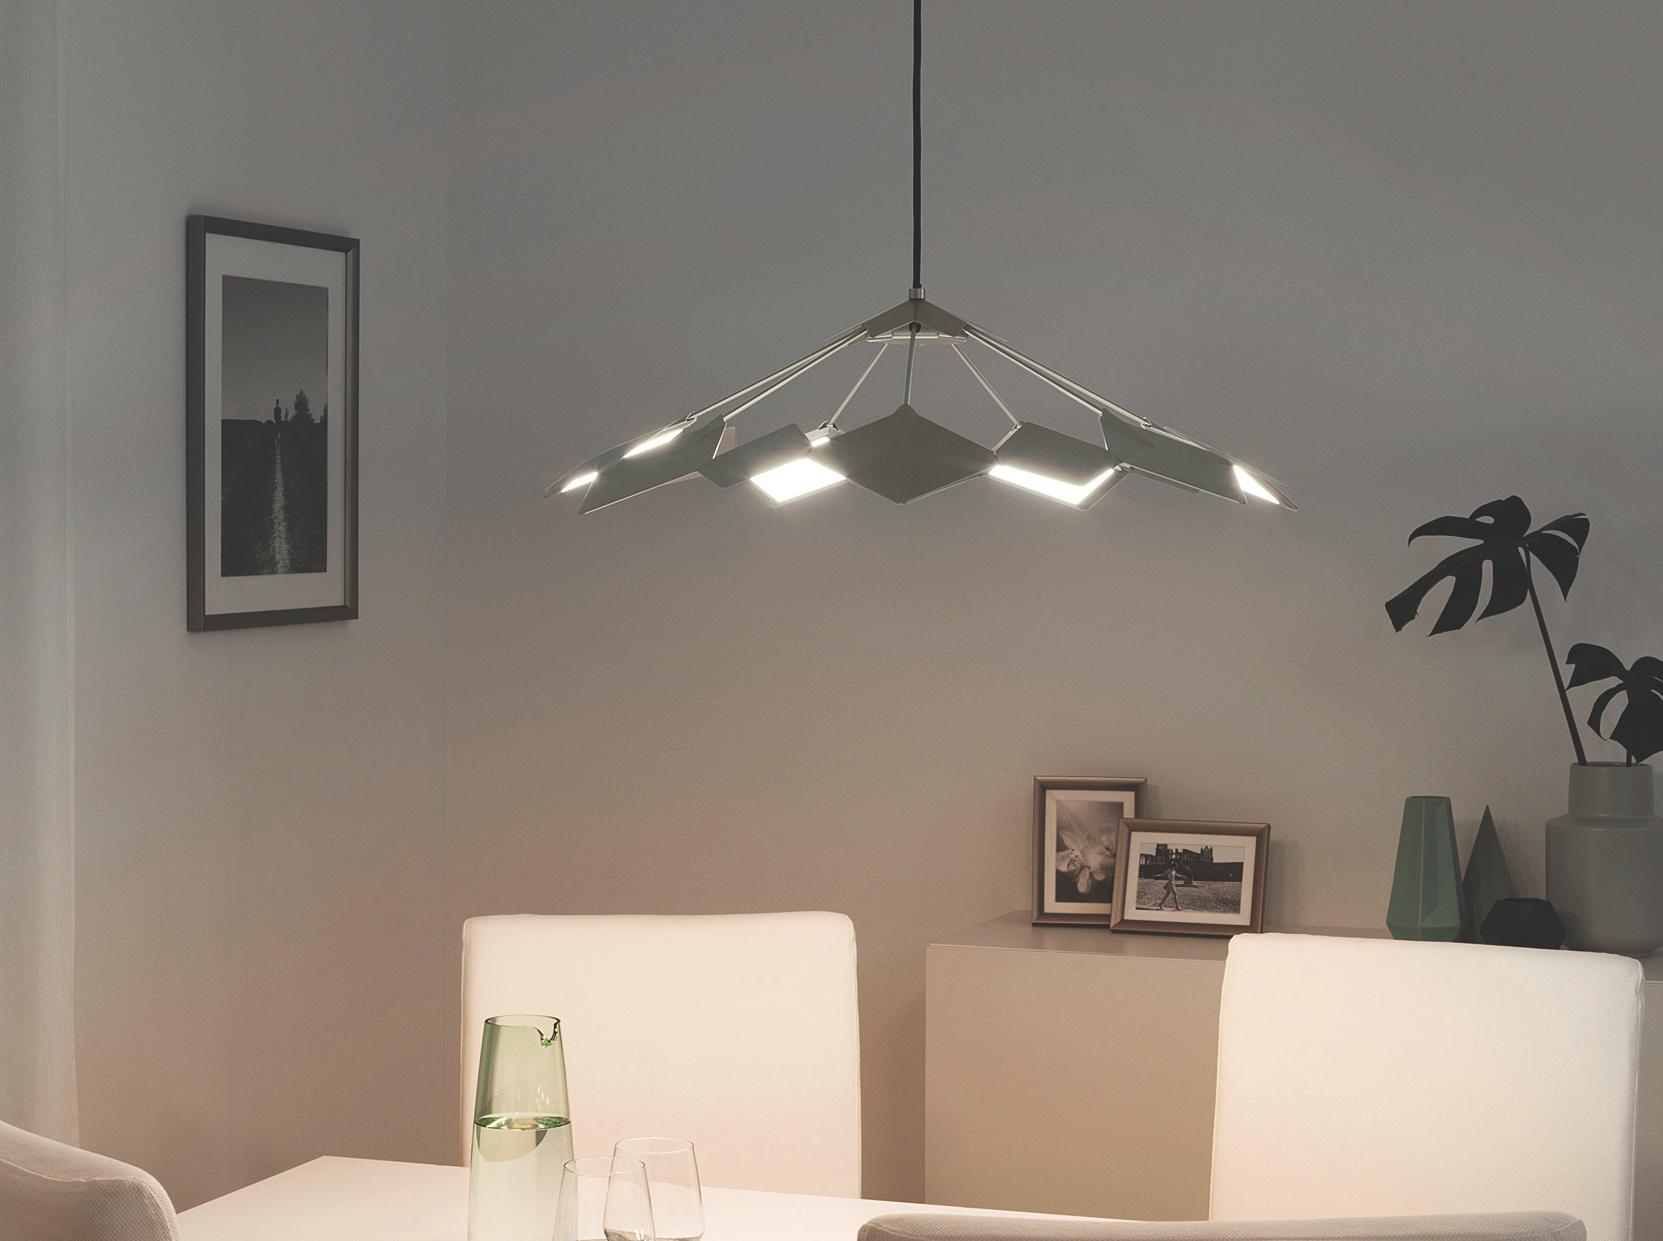 Ikea Staande Spiegel : Am markt technology review heise select